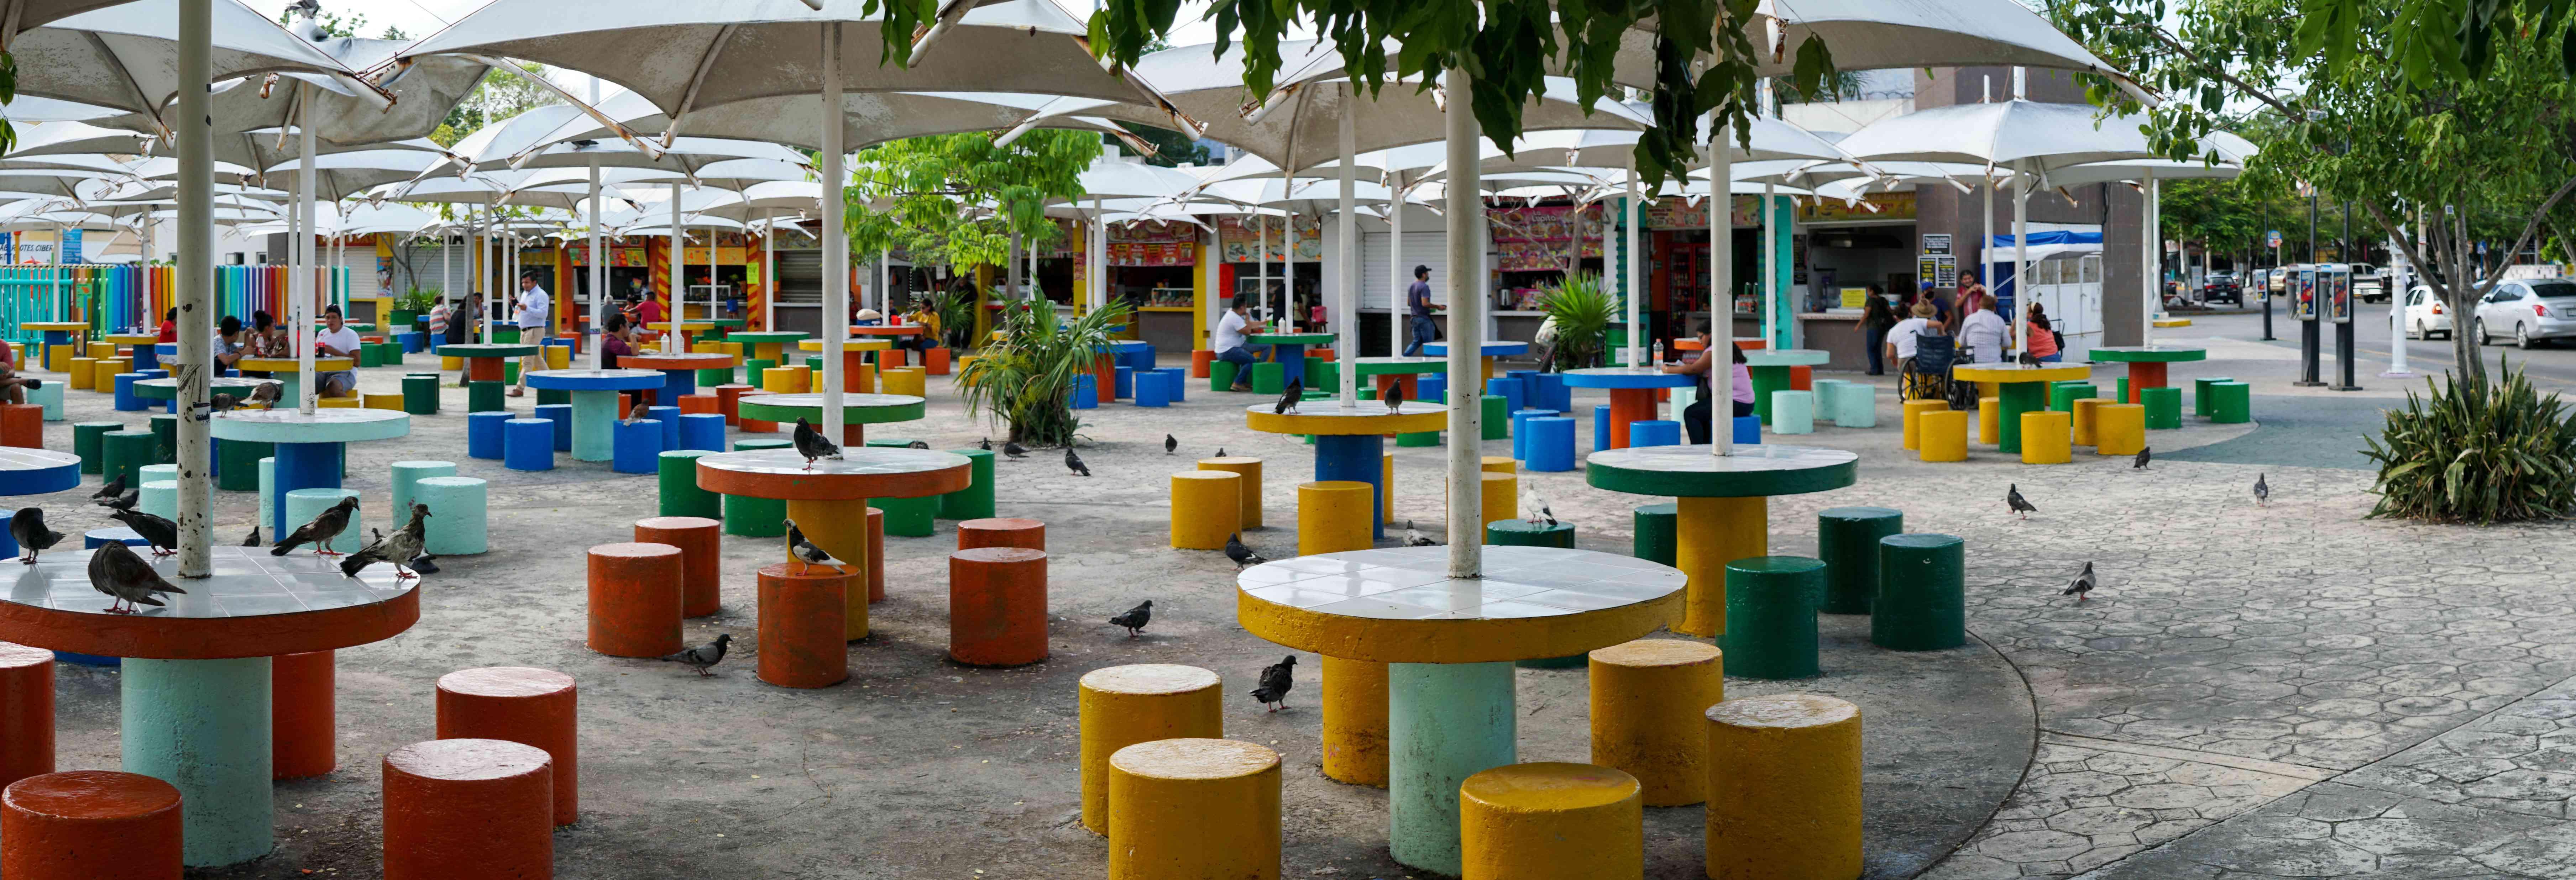 Empty colorful tables in Parque Las Palapas